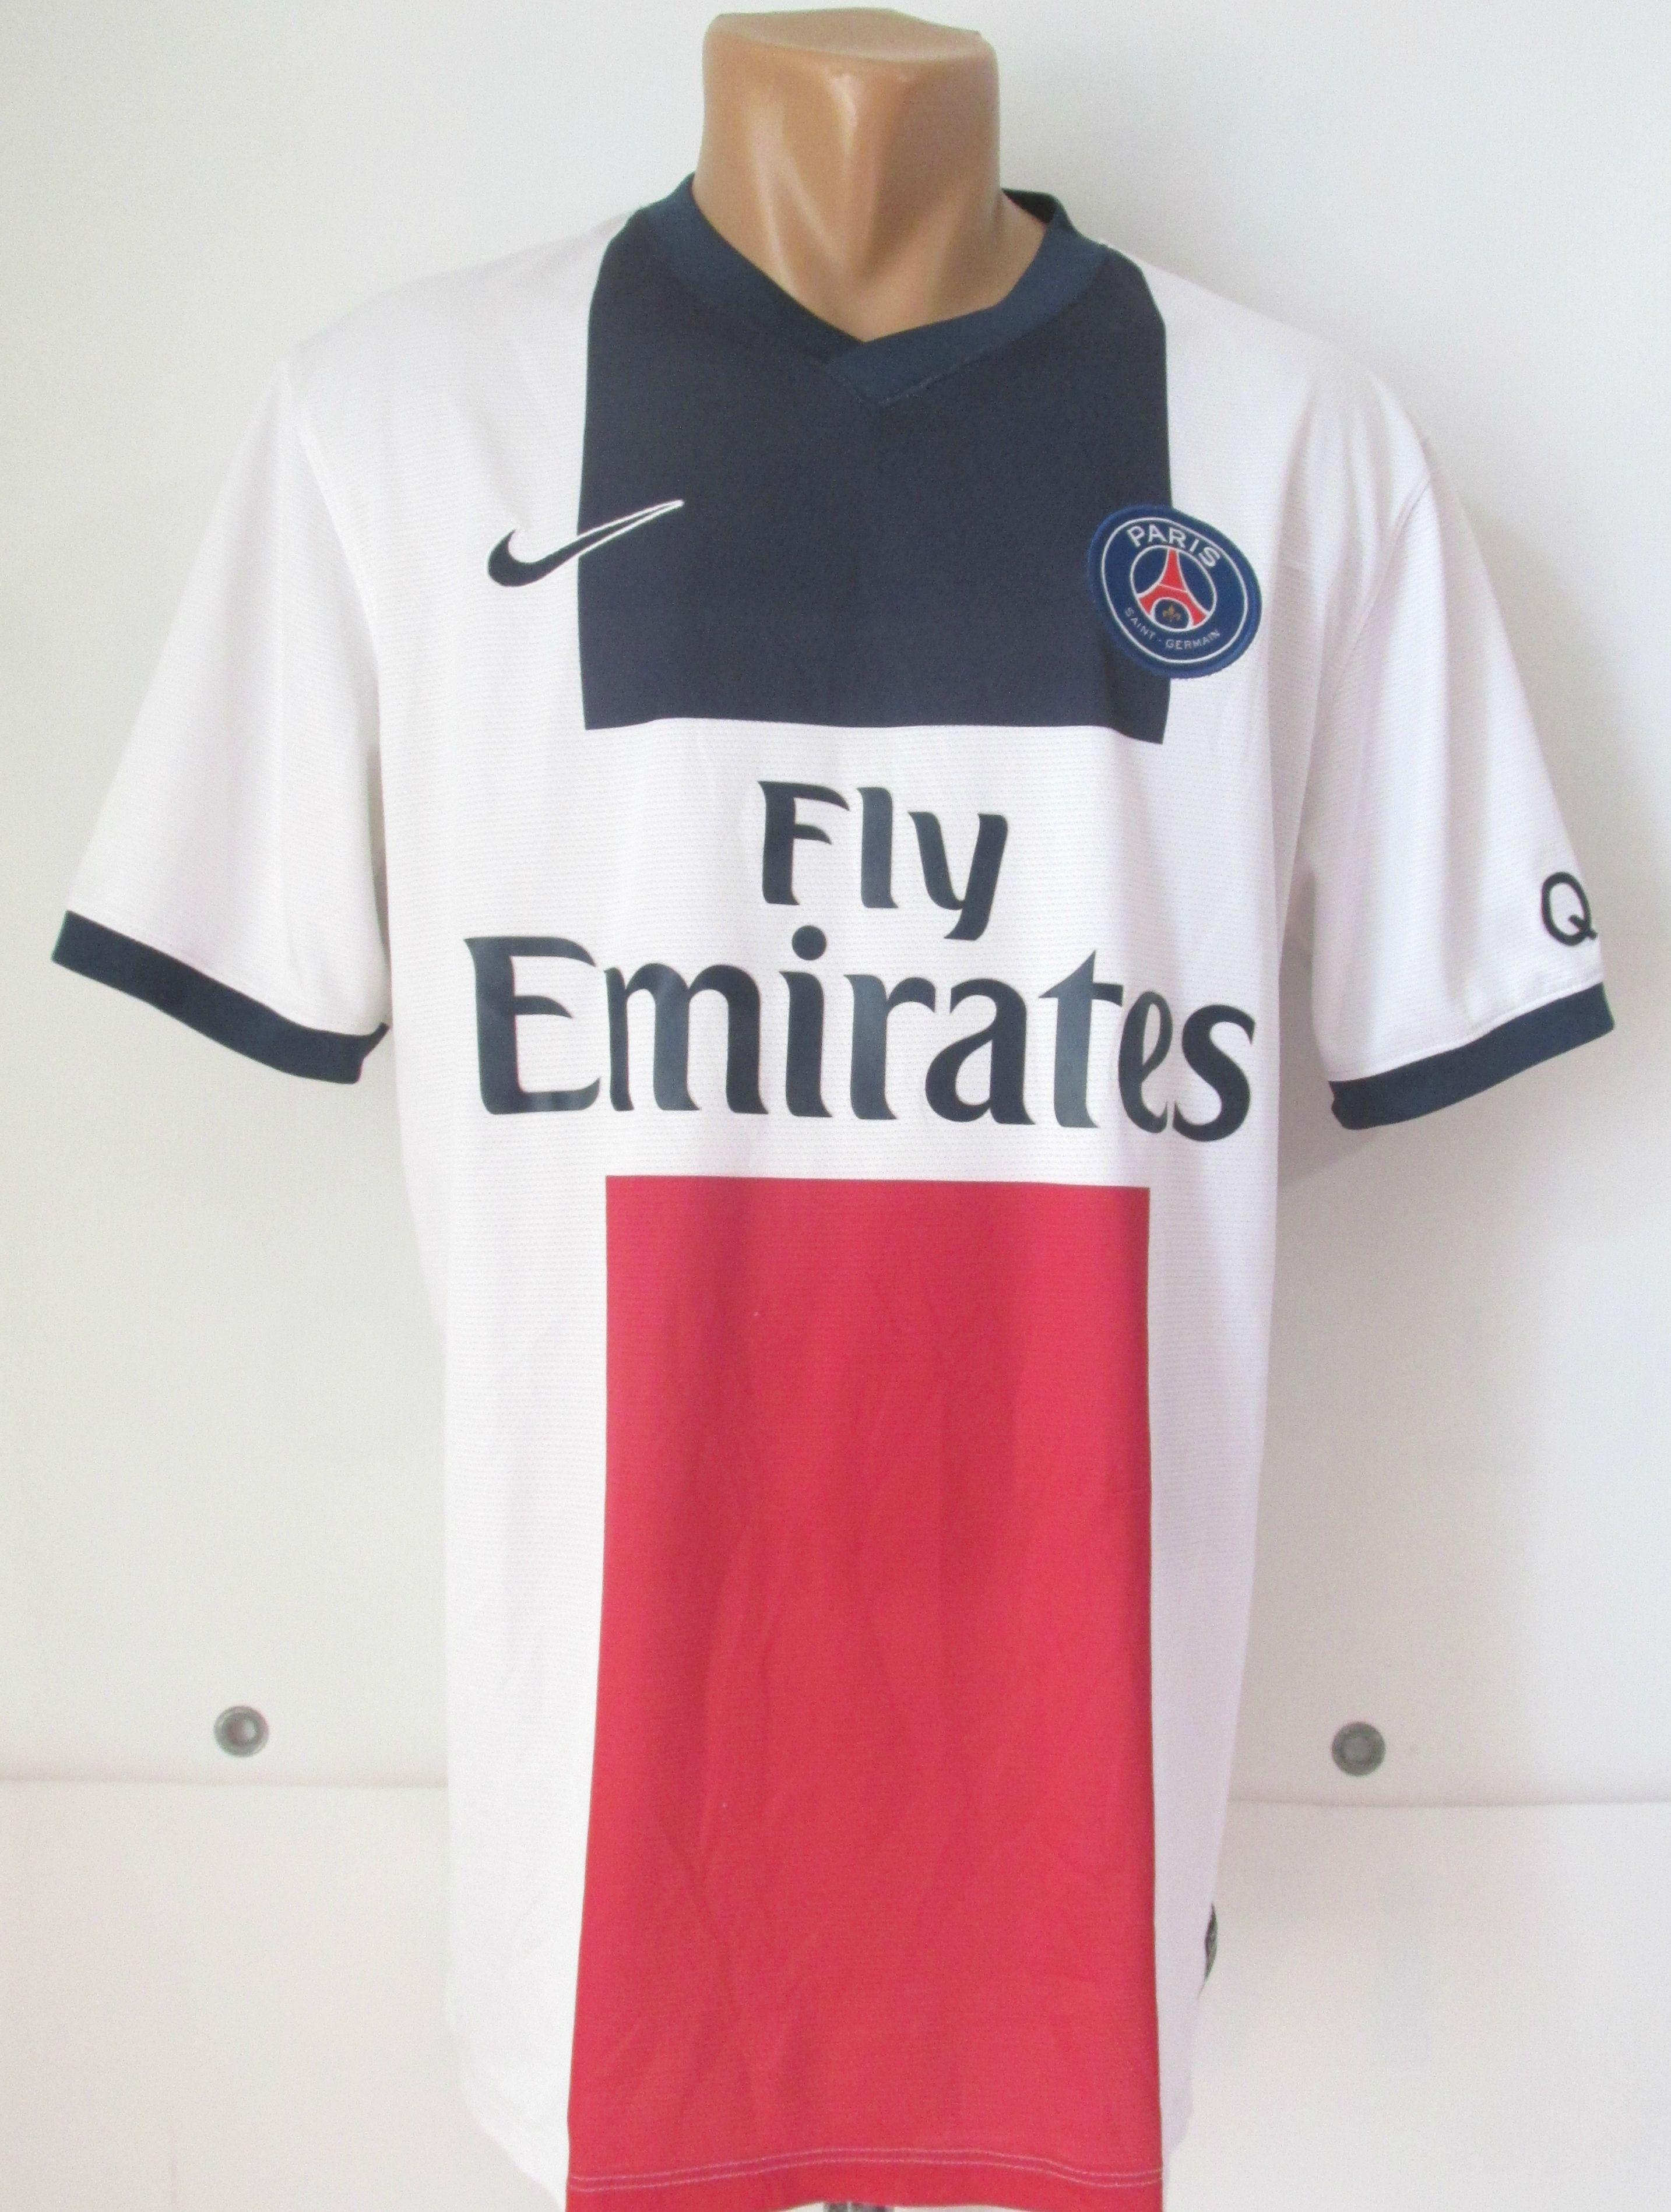 6d334d22c Paris Saint-Germain 2013 2014 away football shirt by Nike PSG soccer  maillot jersey France  PSG  Paris  ParisSaintGermain  maiilot  nike  France  ...